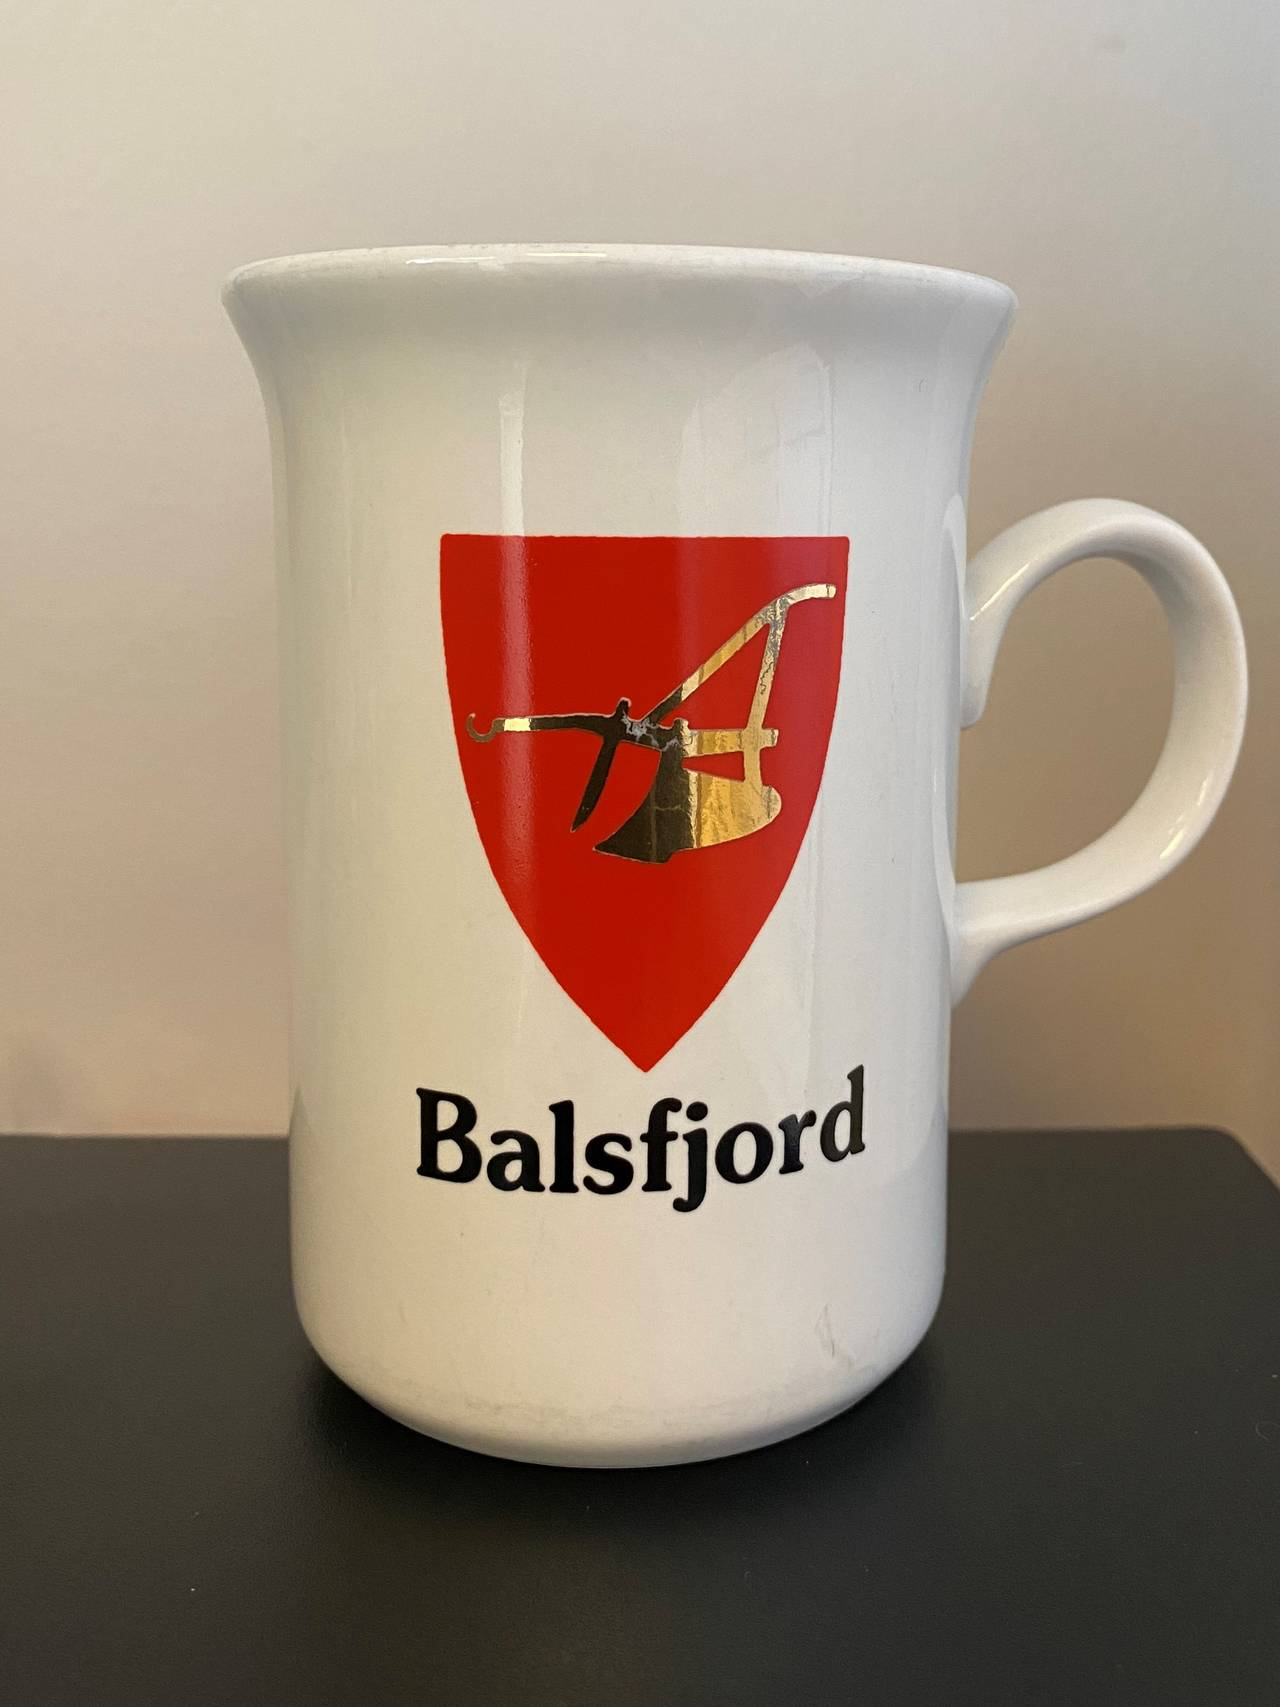 Balsfjord kommune sitt krus